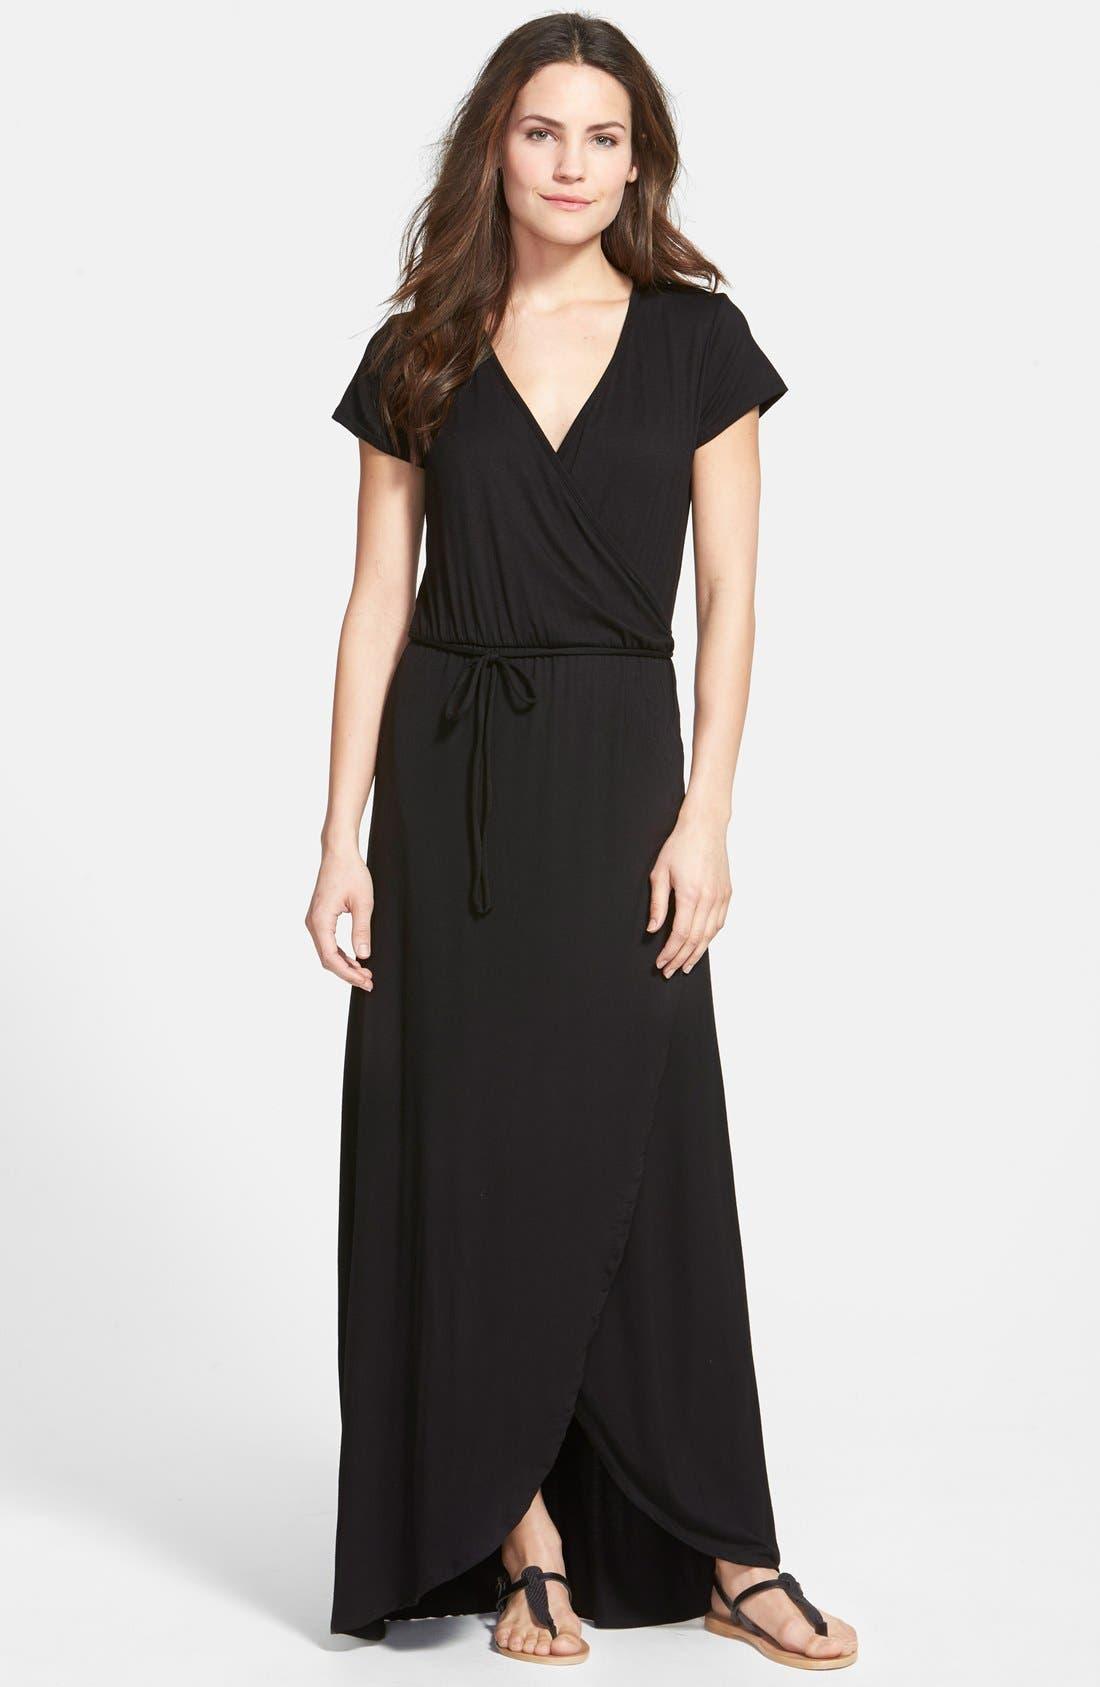 Alternate Image 1 Selected - Loveappella Cap Sleeve Faux Wrap Jersey Maxi Dress (Regular & Petite)